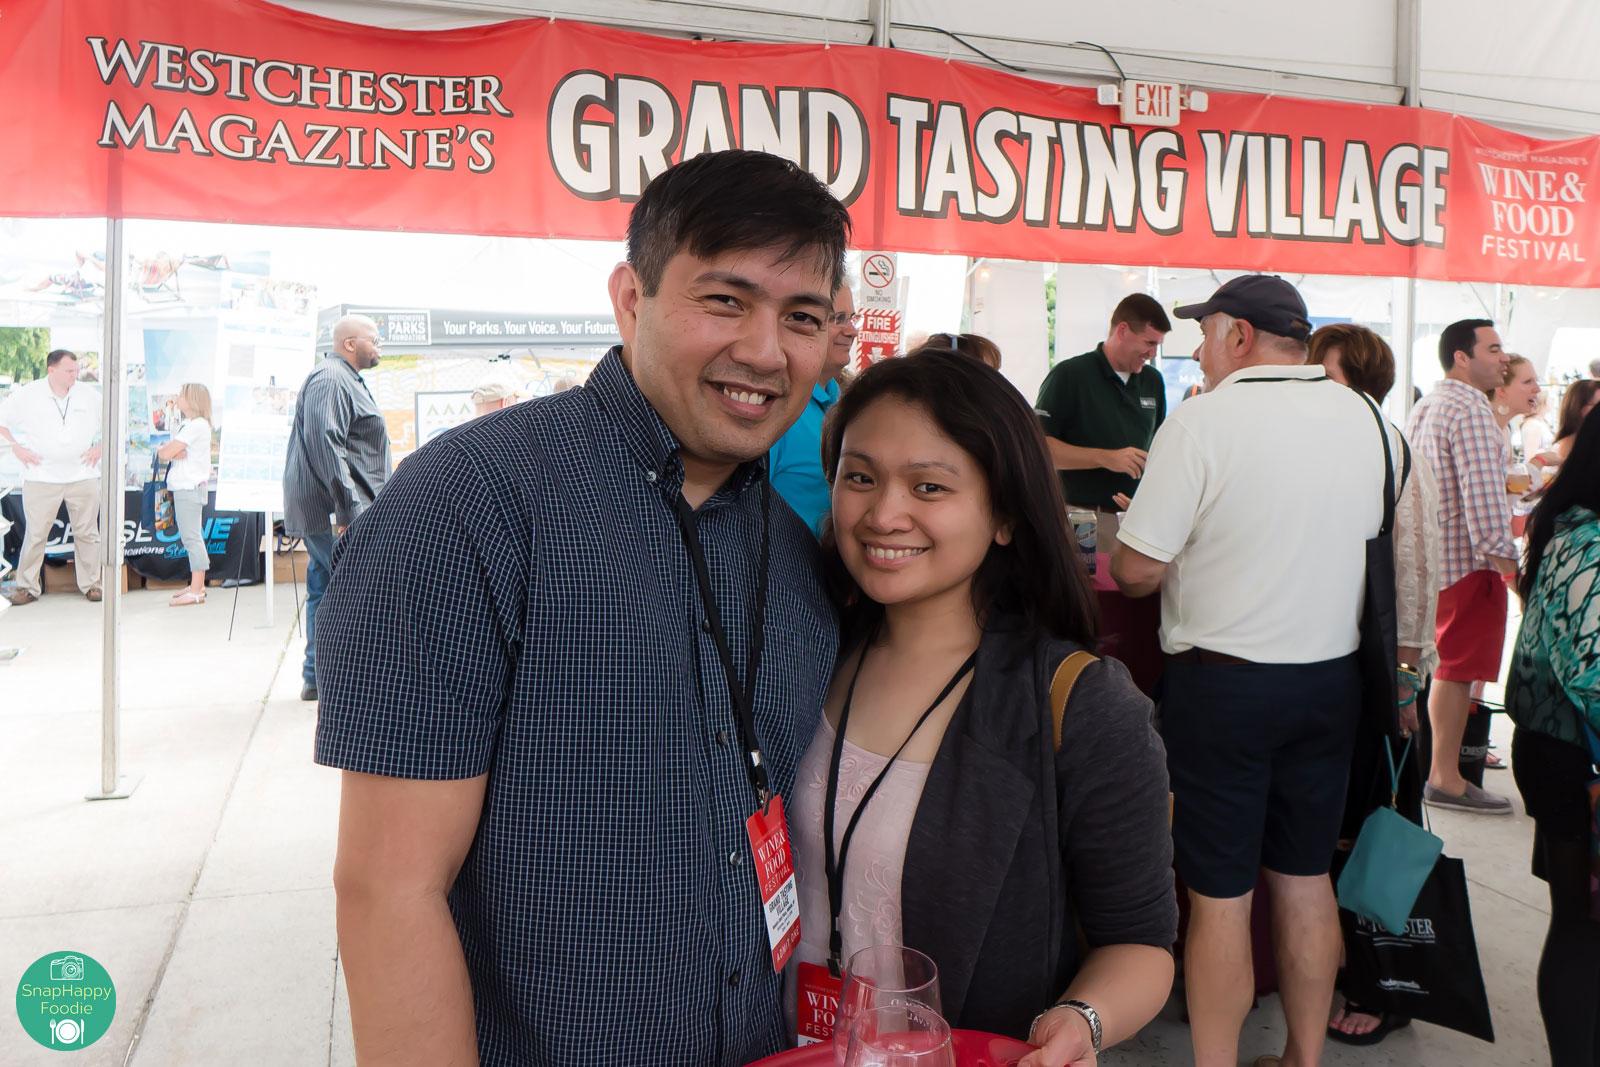 2016westchestermagwinefoodfest-32